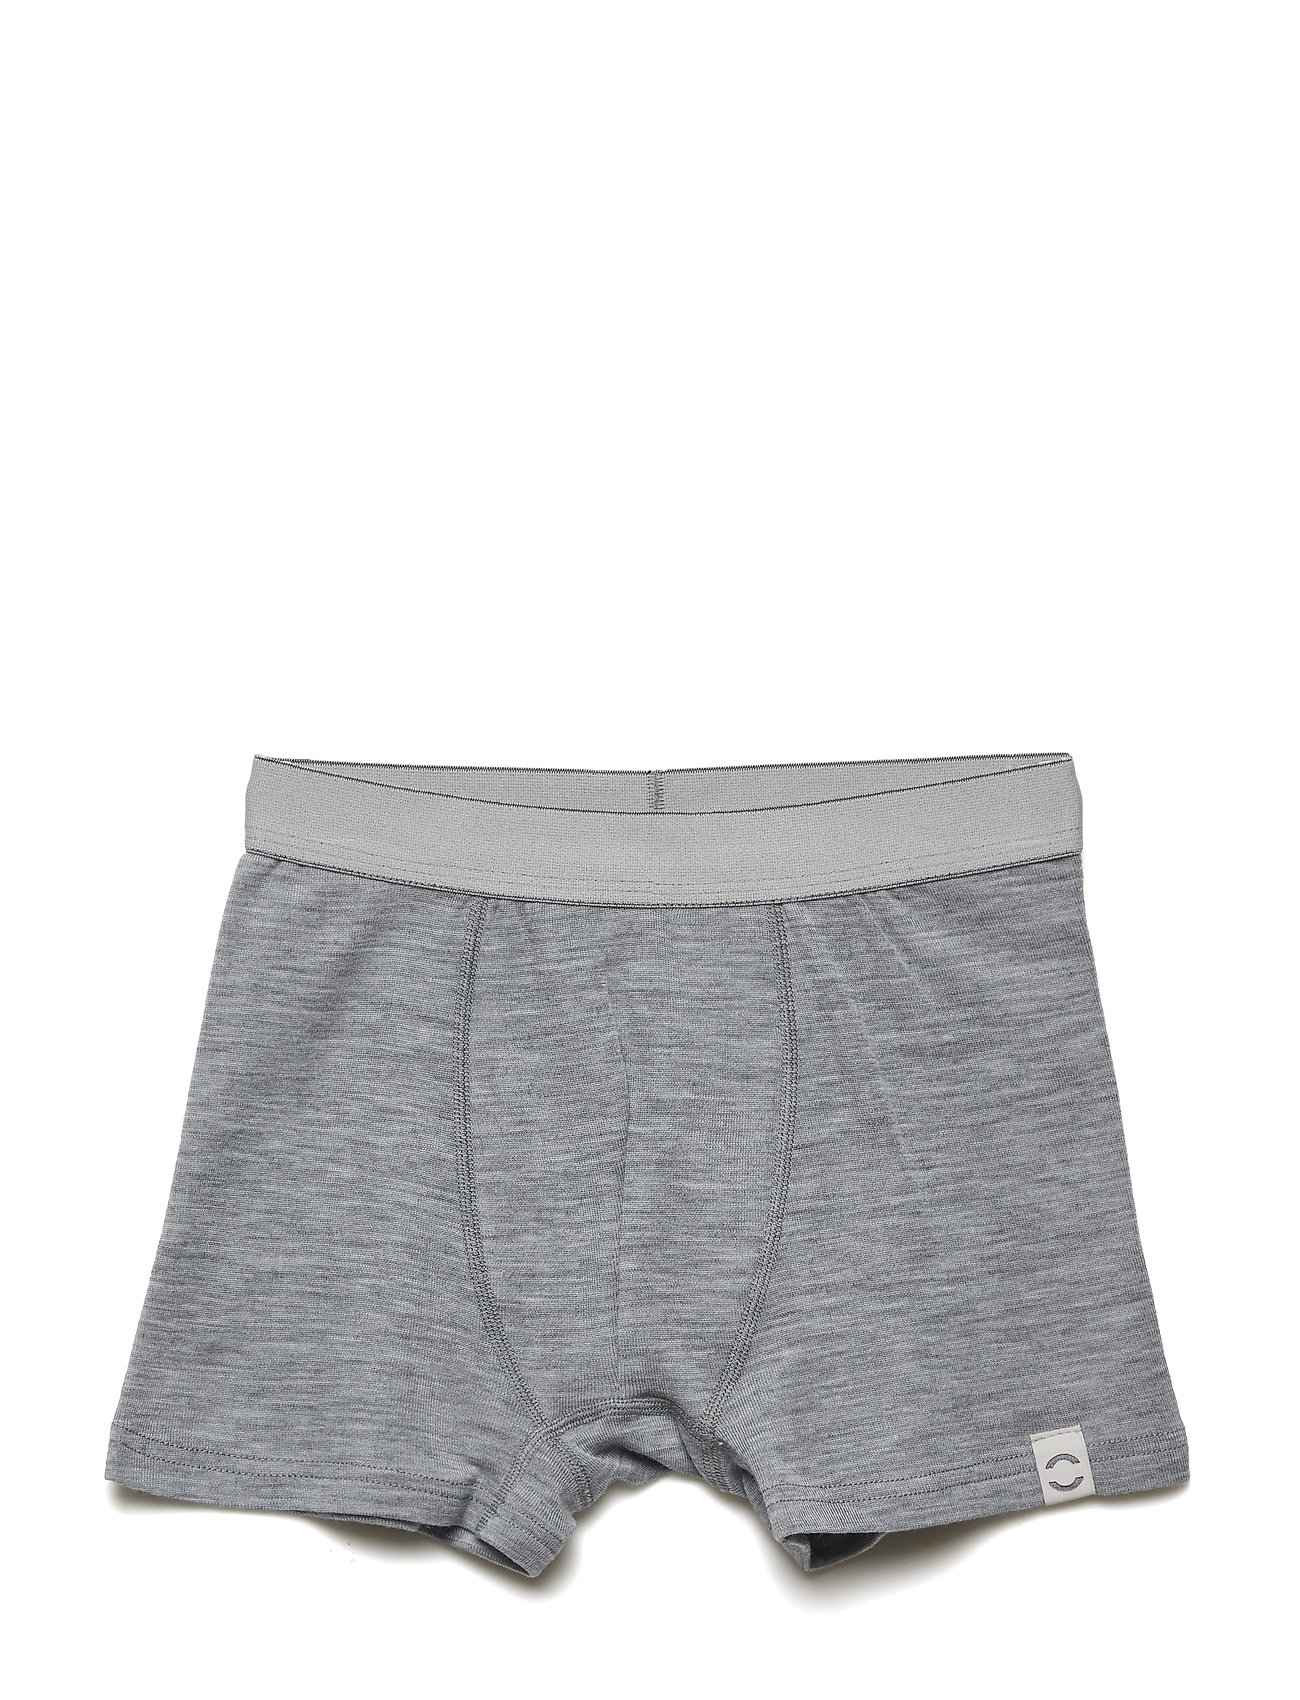 Mikk-Line WOOL Shorts Boys - PEARL GREY MELANGE